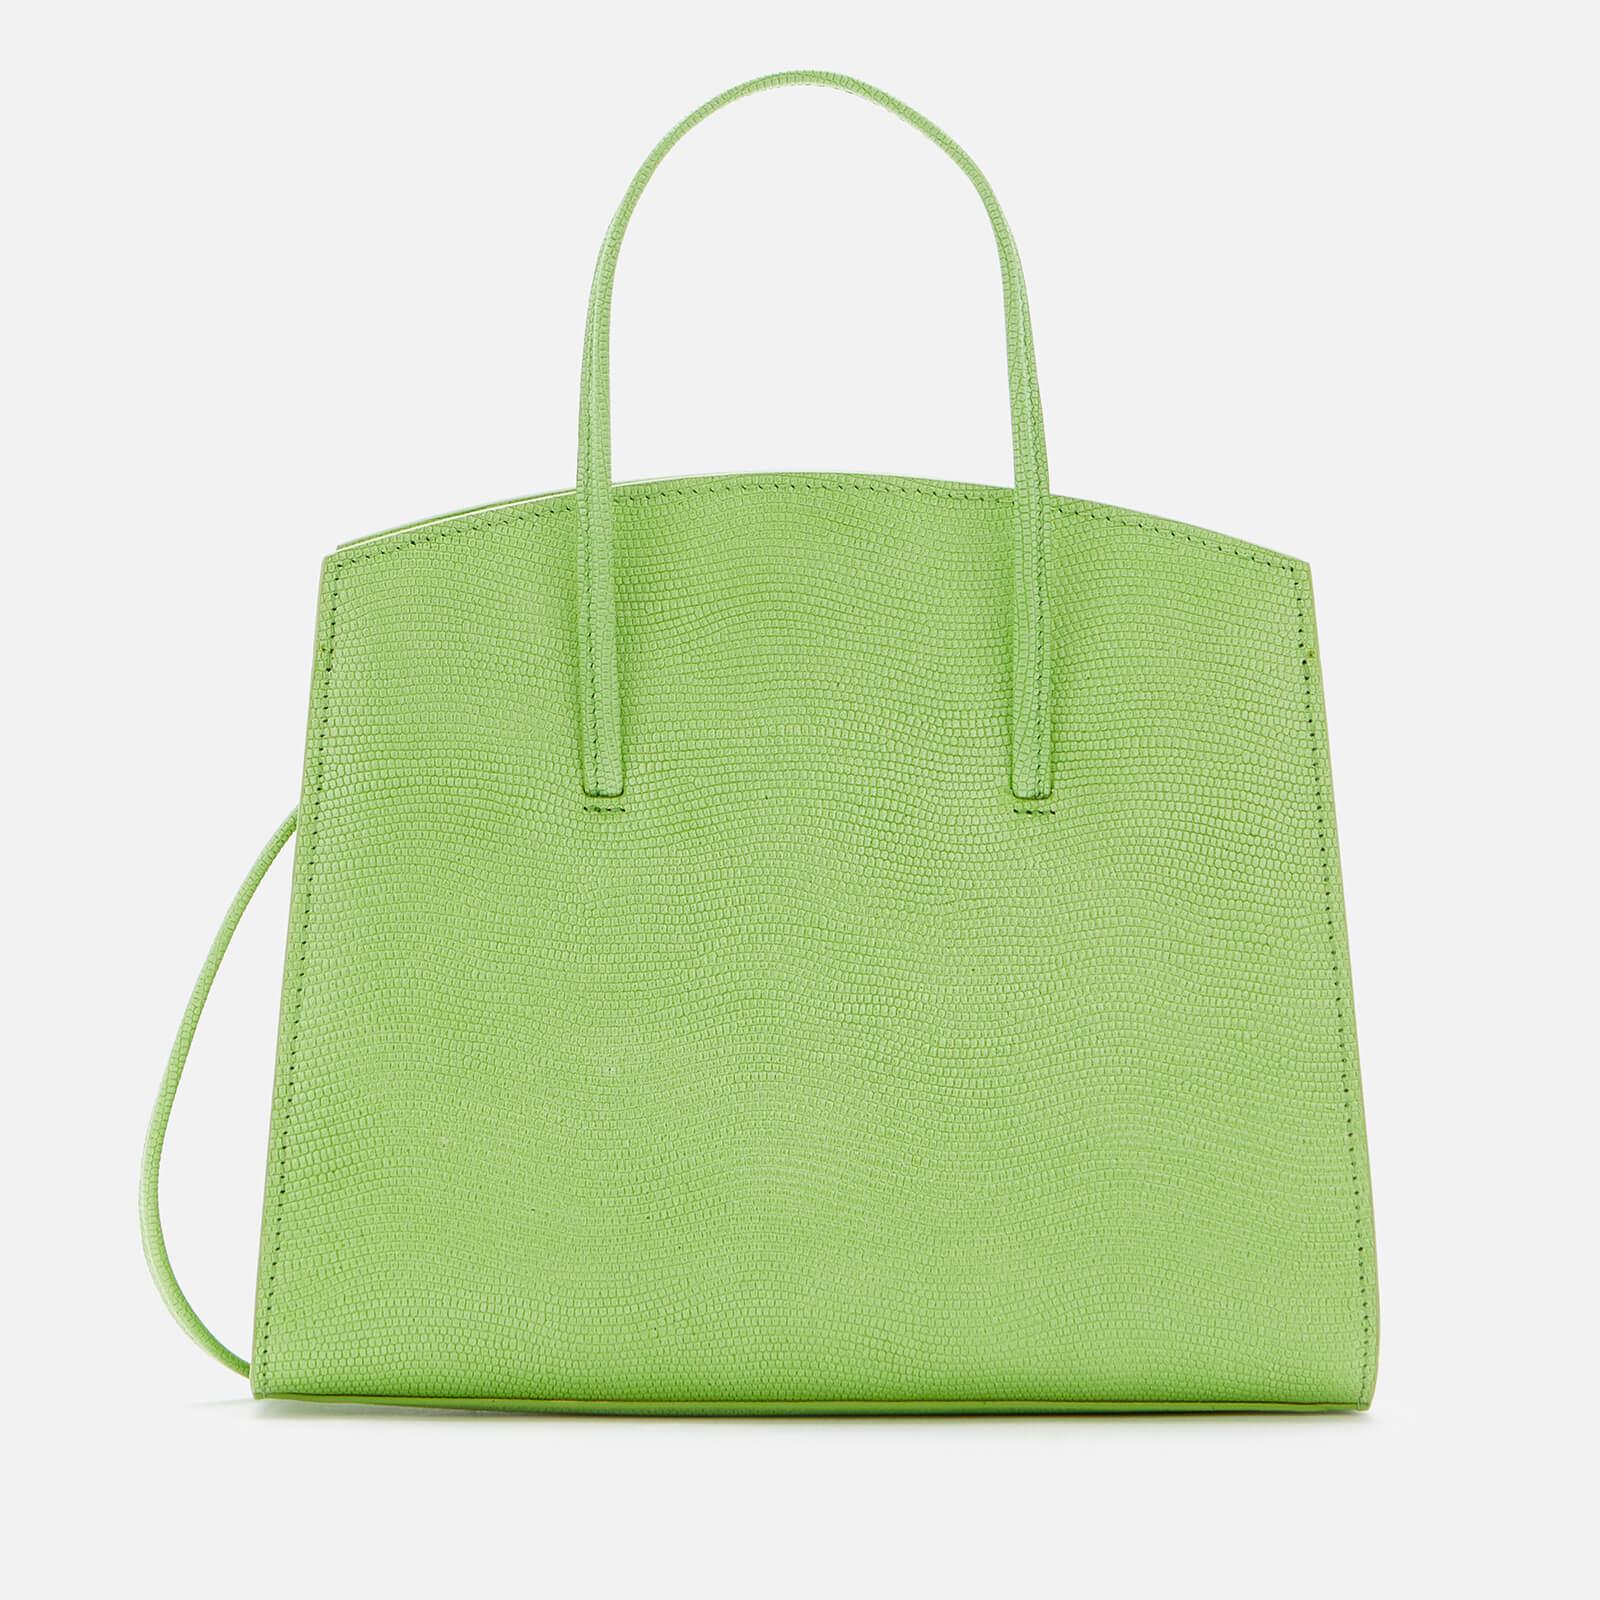 Little Liffner Women's Minimal Mini Tote Bag Lizard - Acid Green